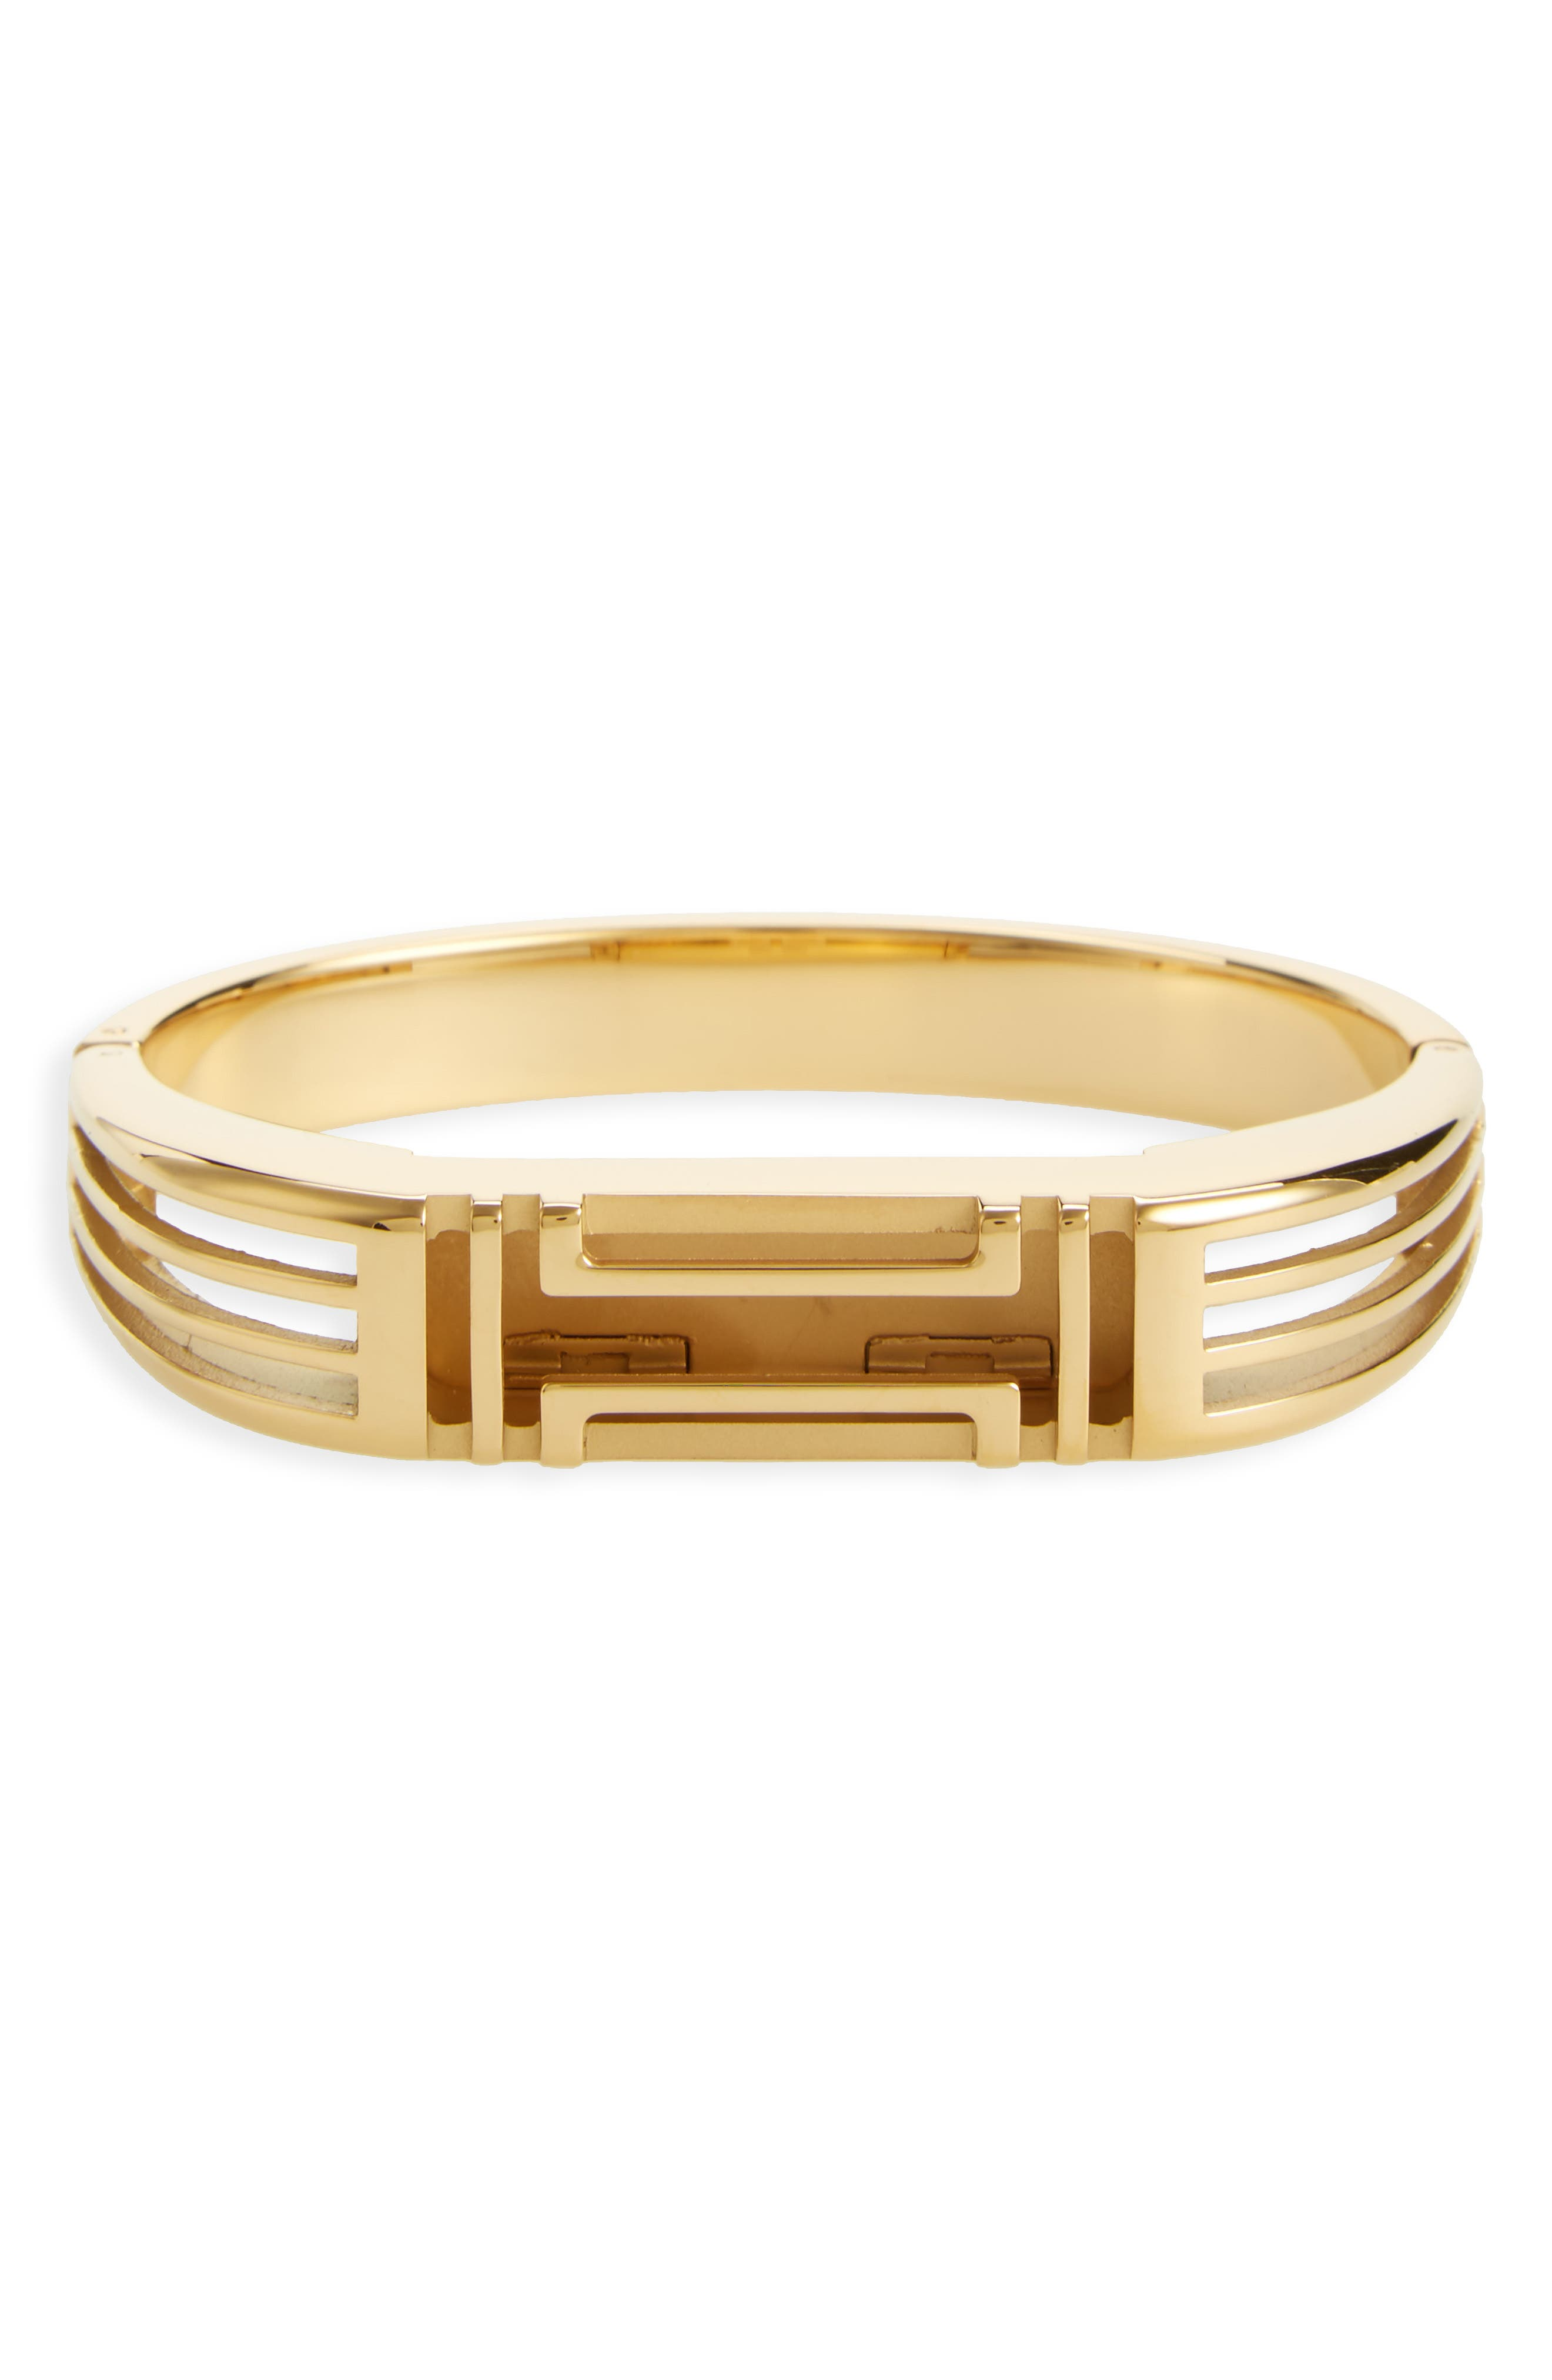 Alternate Image 1 Selected - Tory Burch for Fitbit® Hinge Bracelet